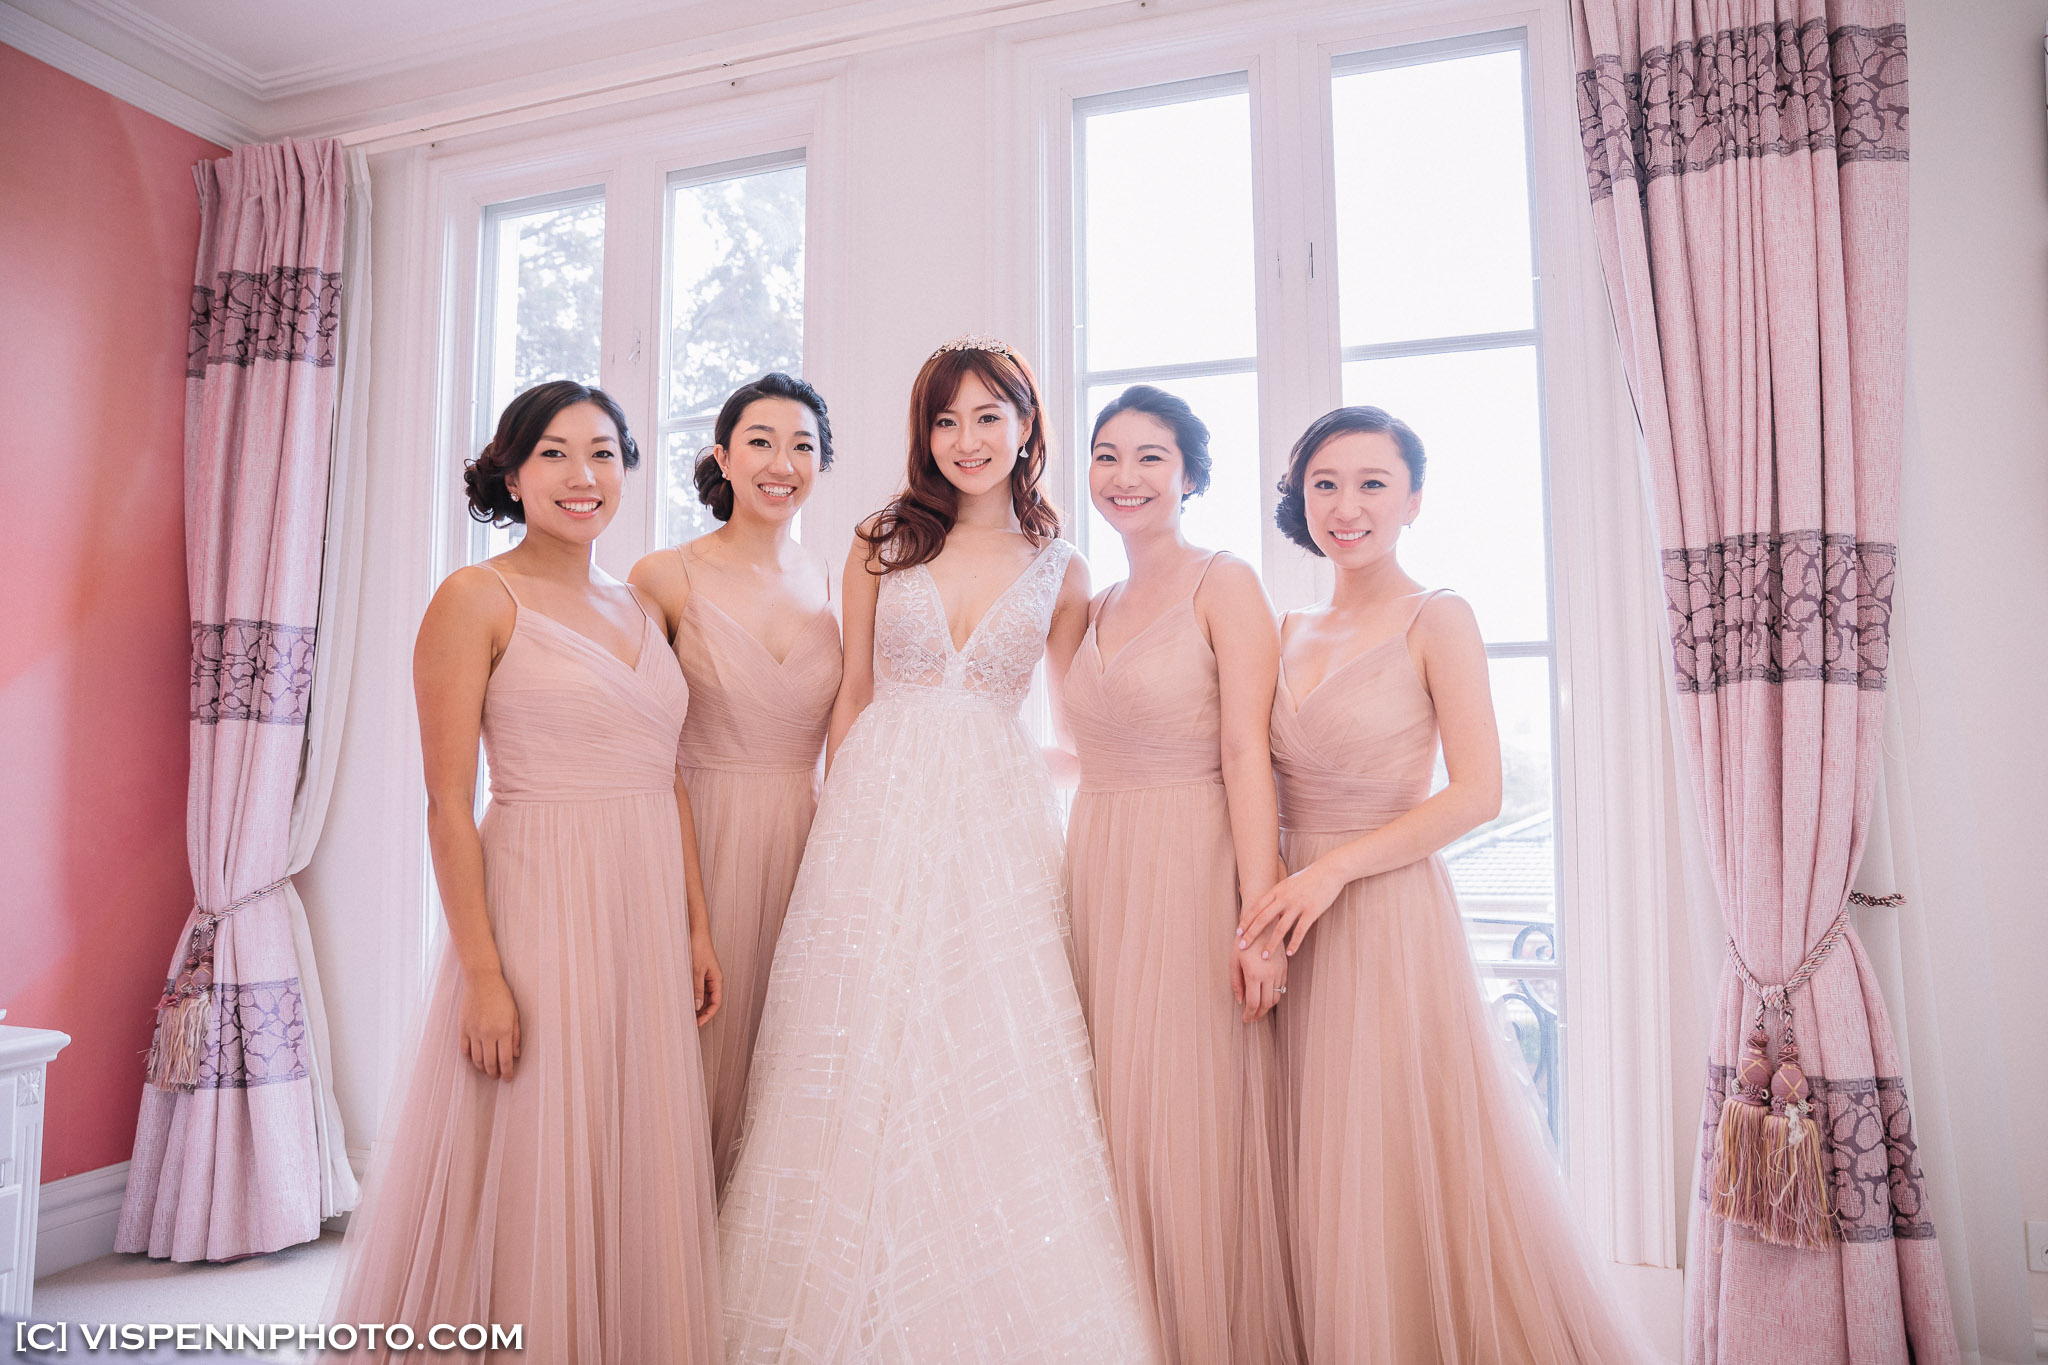 WEDDING DAY Photography Melbourne ZHPENN 0051 5D4 1658